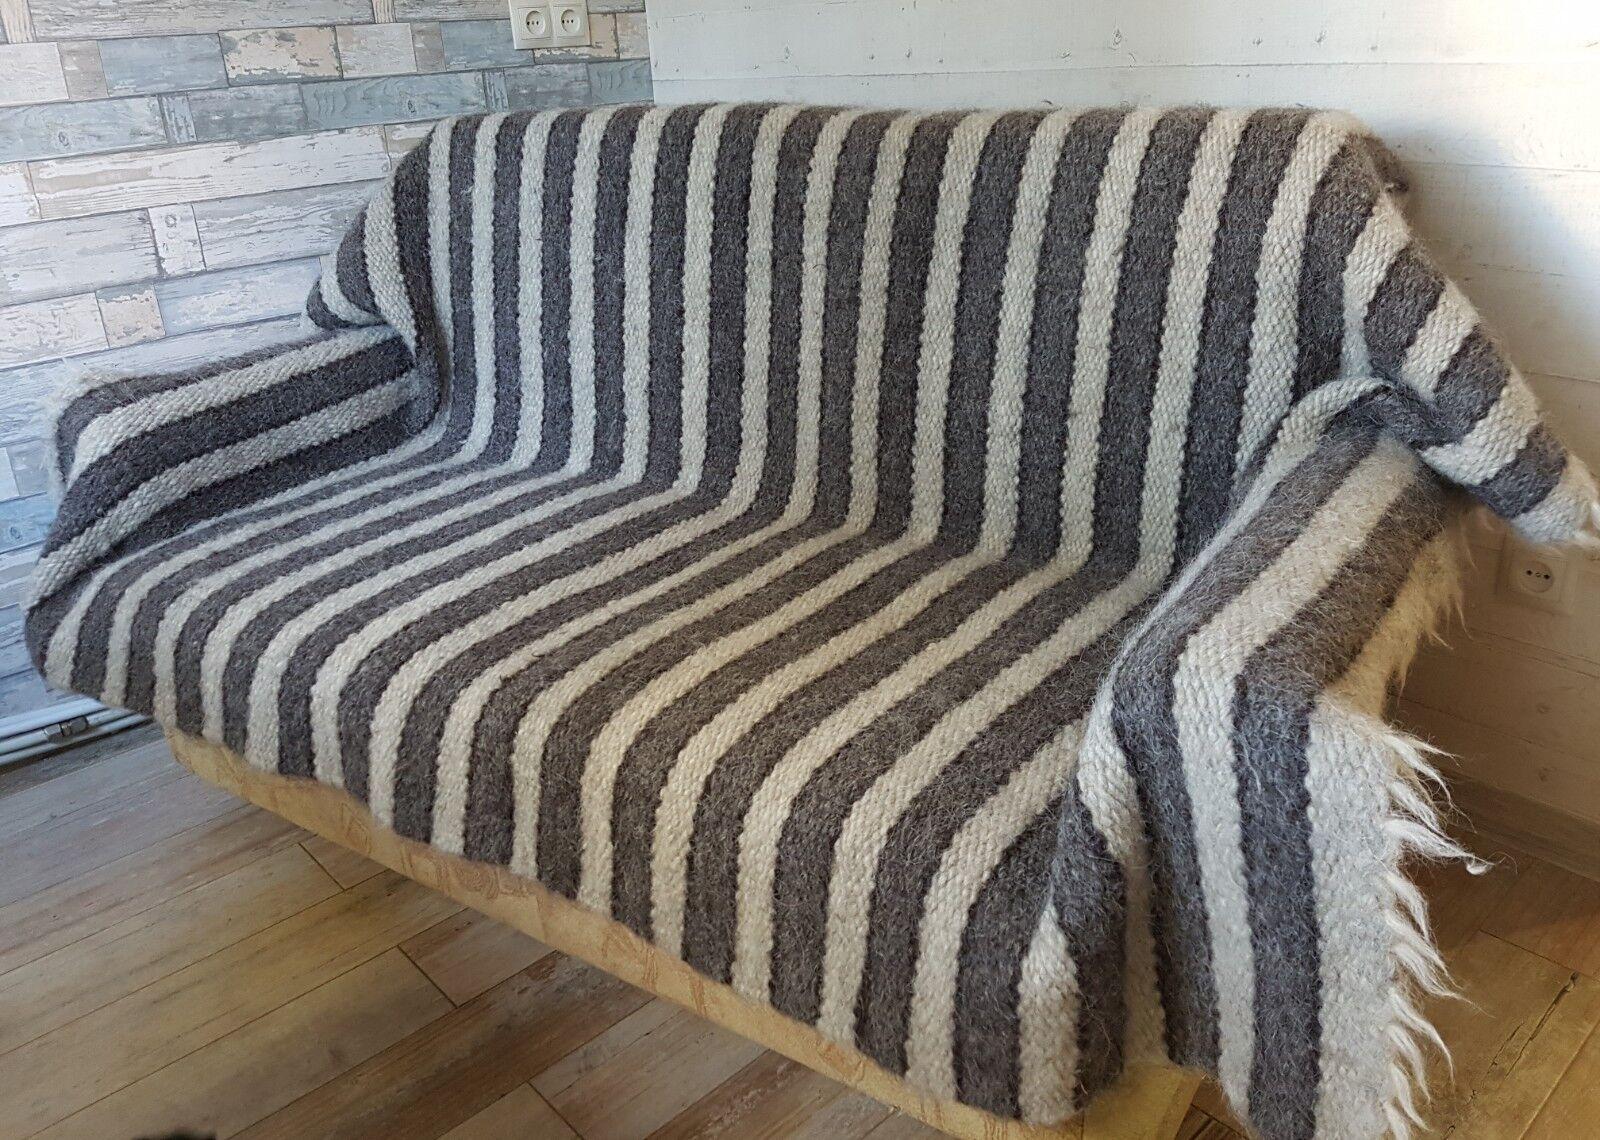 Traditional Hutsul PURE Sheep WOOL hand woven Eco Blanket Plaid Rug 145195 cm